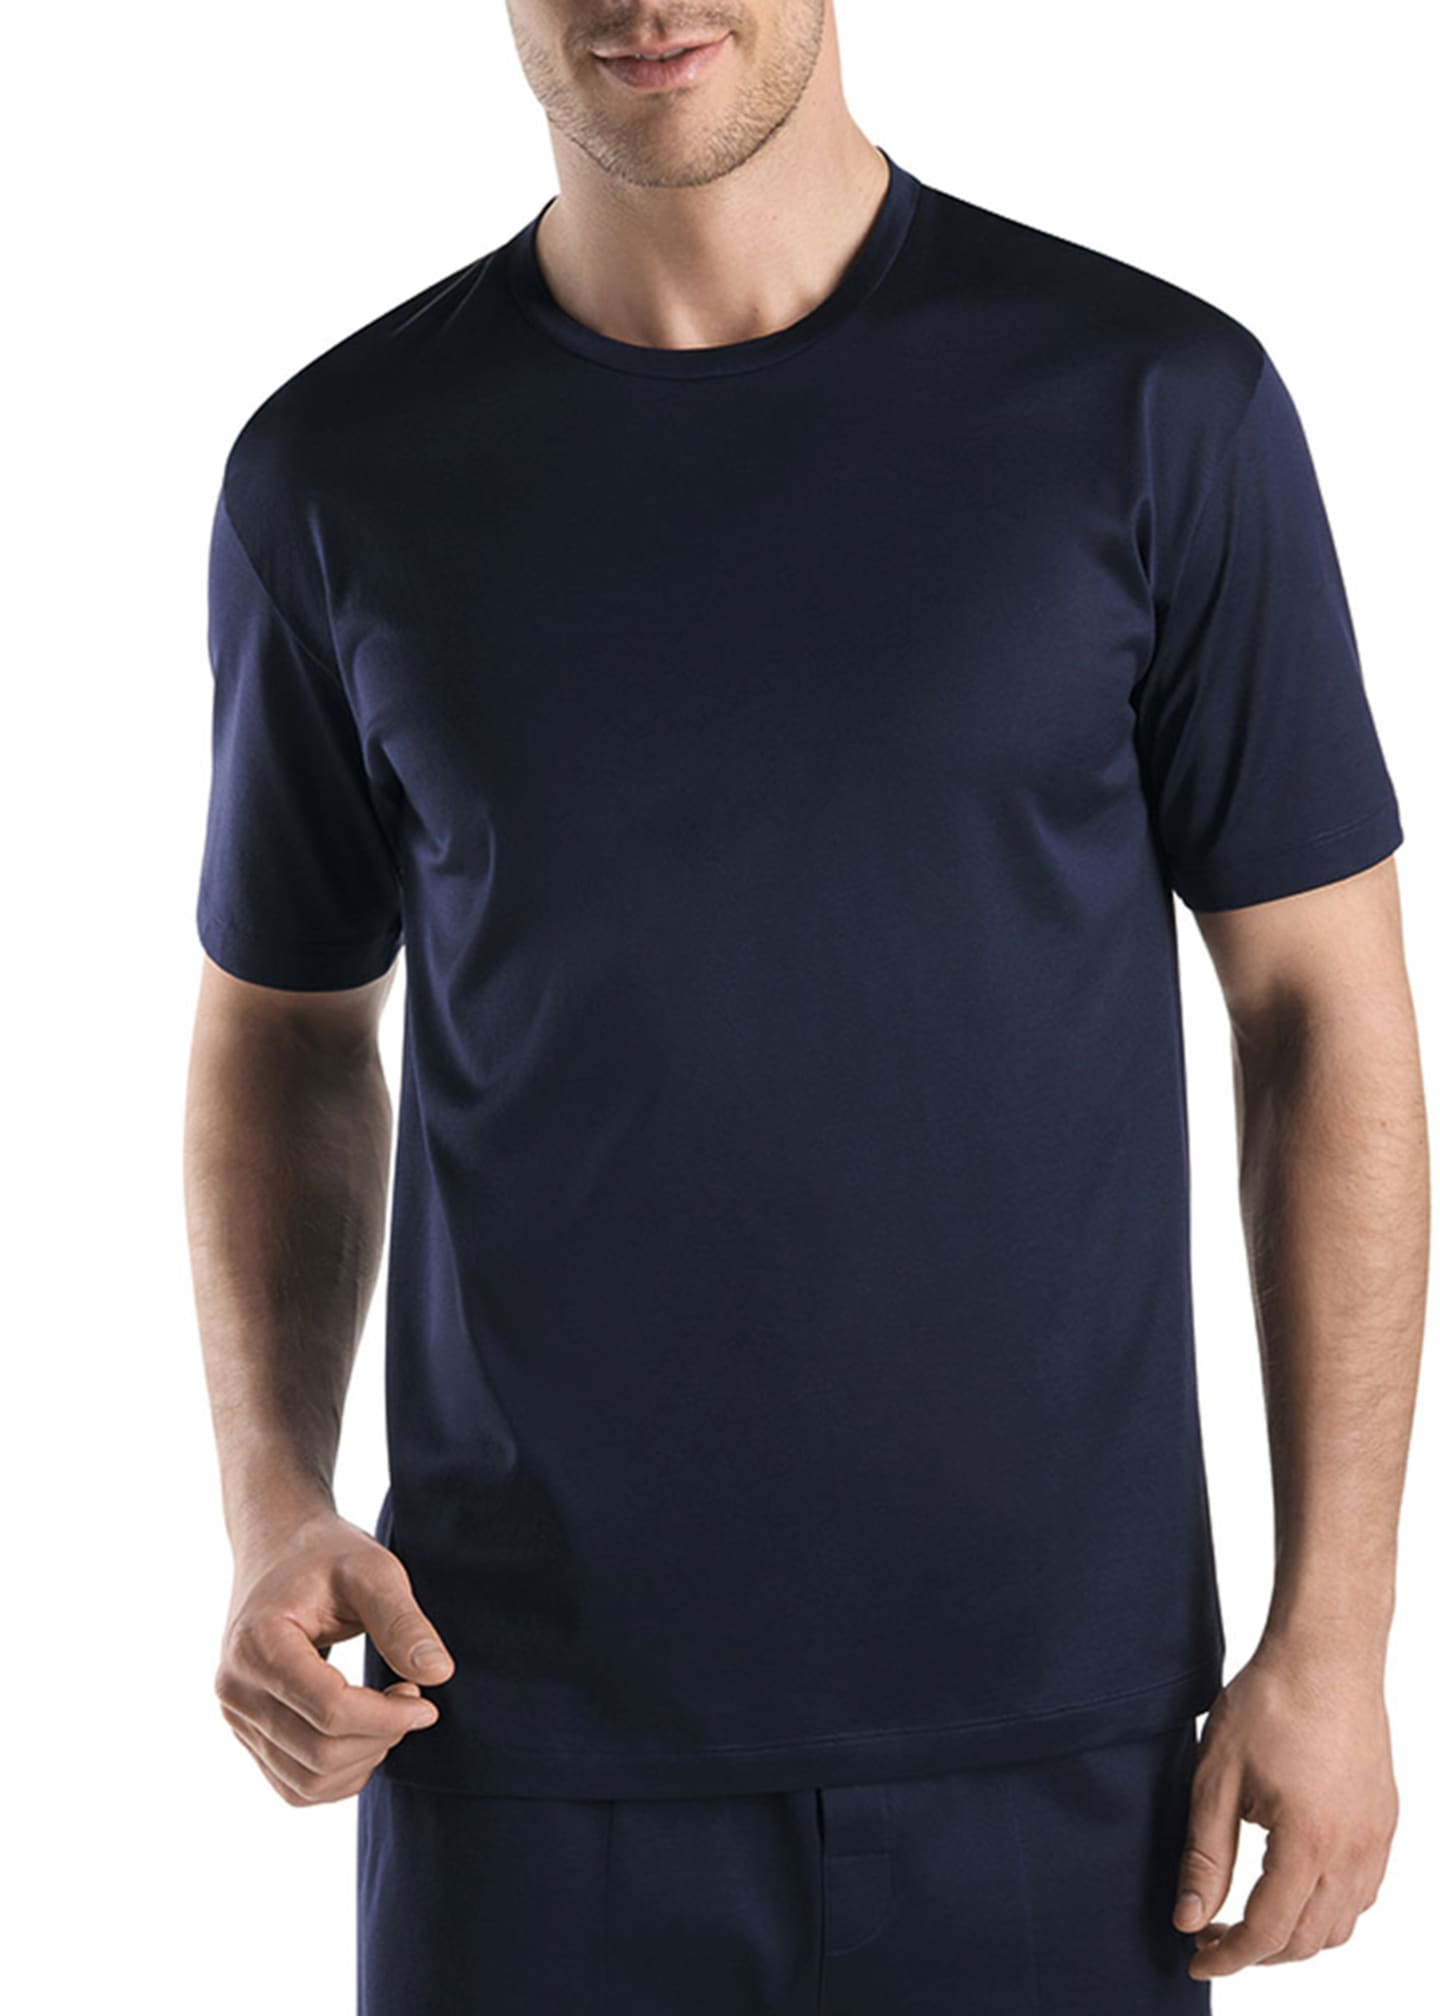 Hanro Sporty Crewneck T-Shirt, Midnight Navy